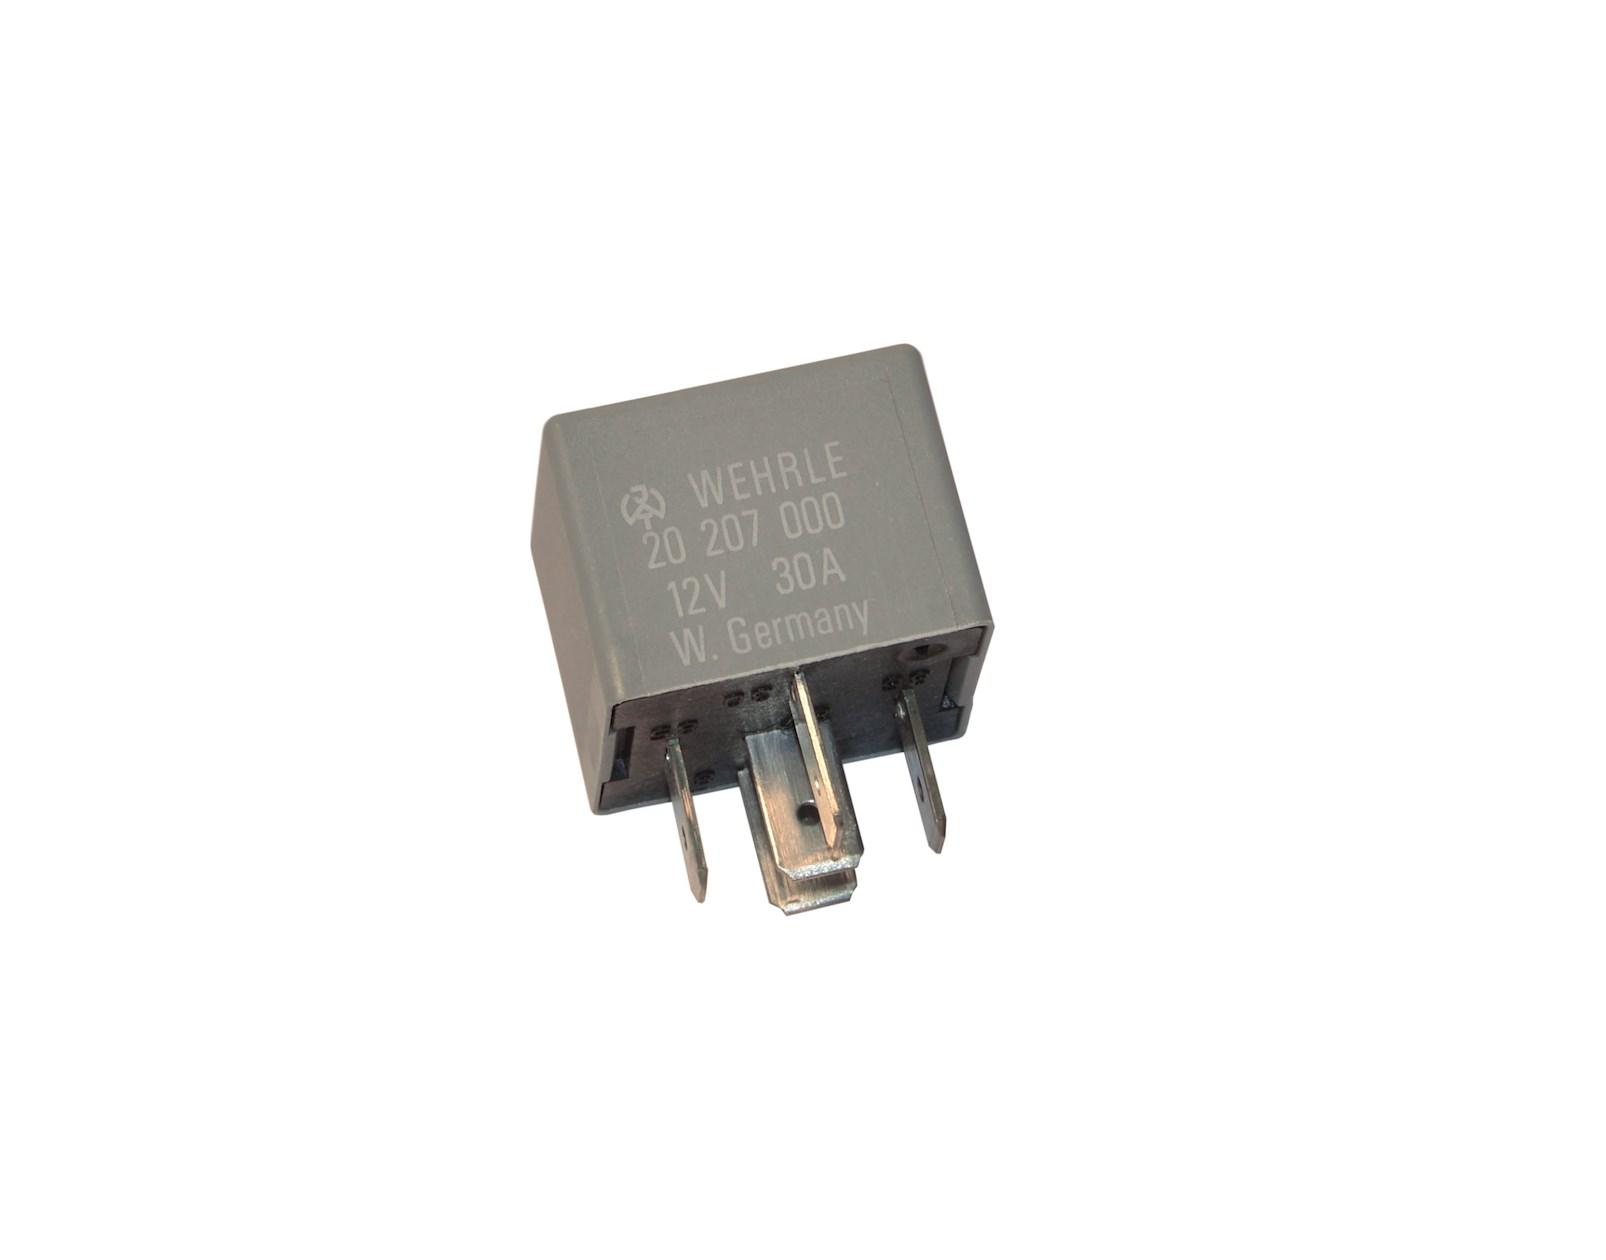 1 pc V23057-B0002-A101  TE  Relais  Relay  SPDT  12VDC  5A  330R  NEW #BP